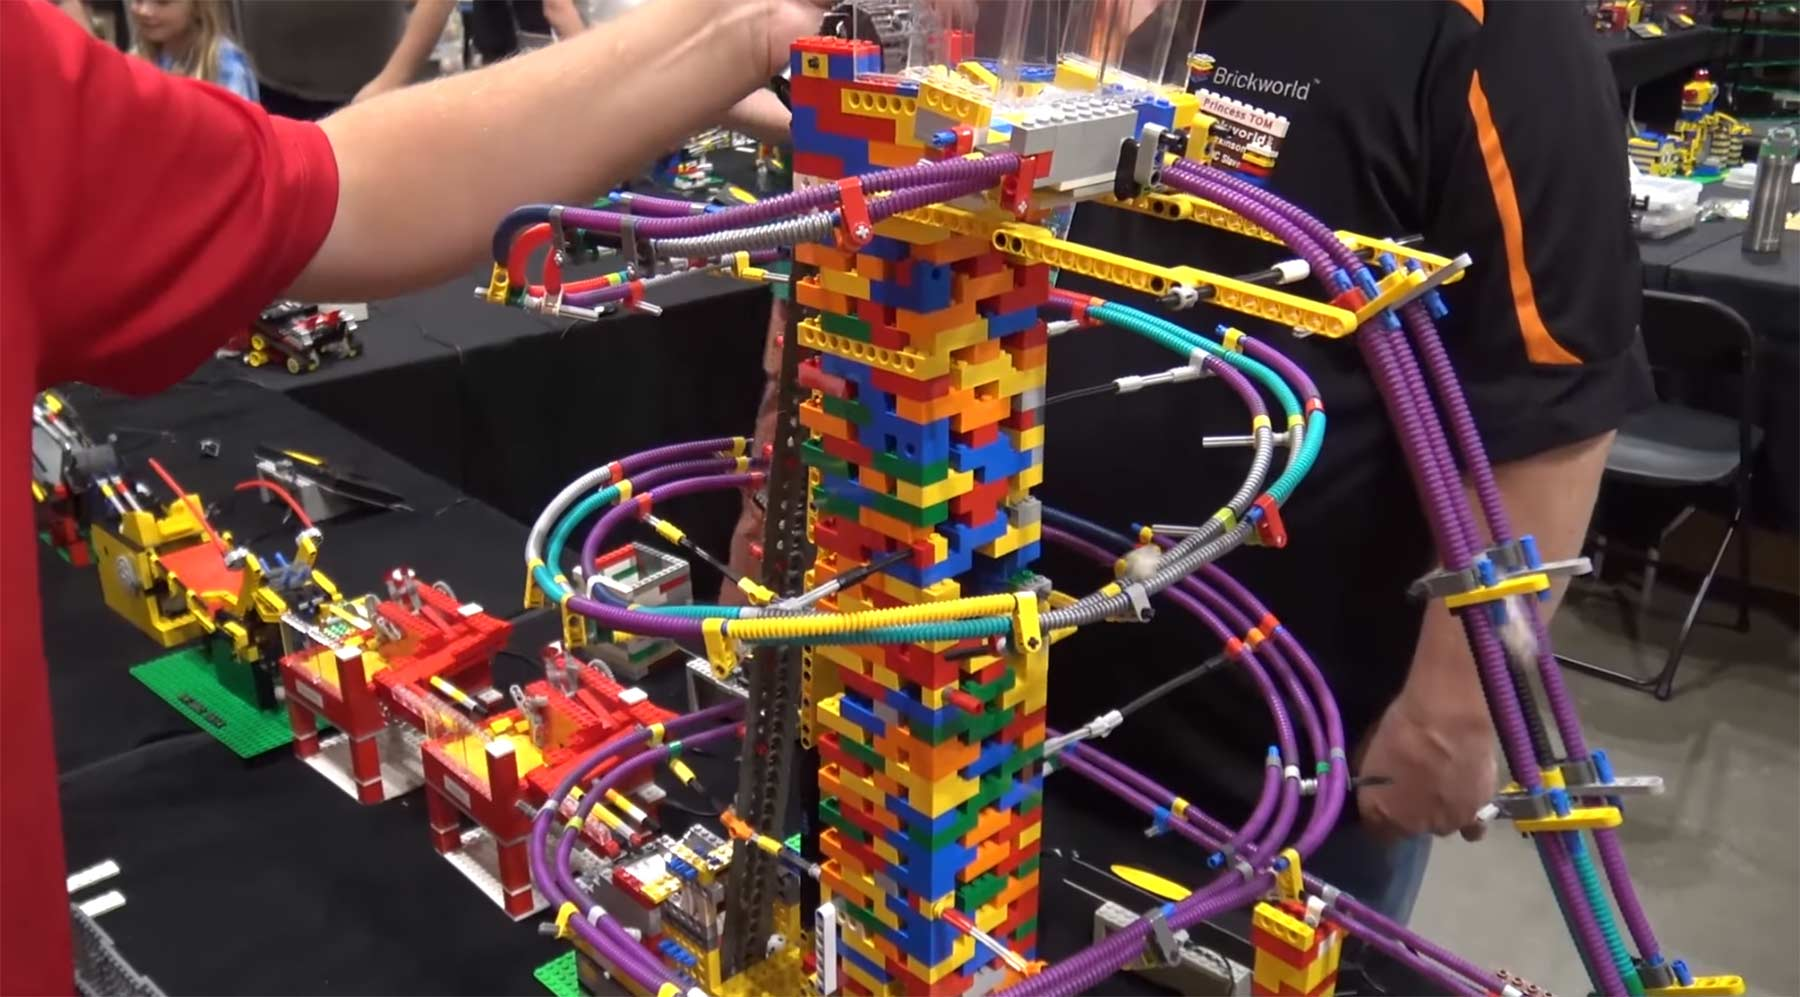 Ultralange LEGO-Ballbeförderungsmaschine ultralange-lego-ballmaschine